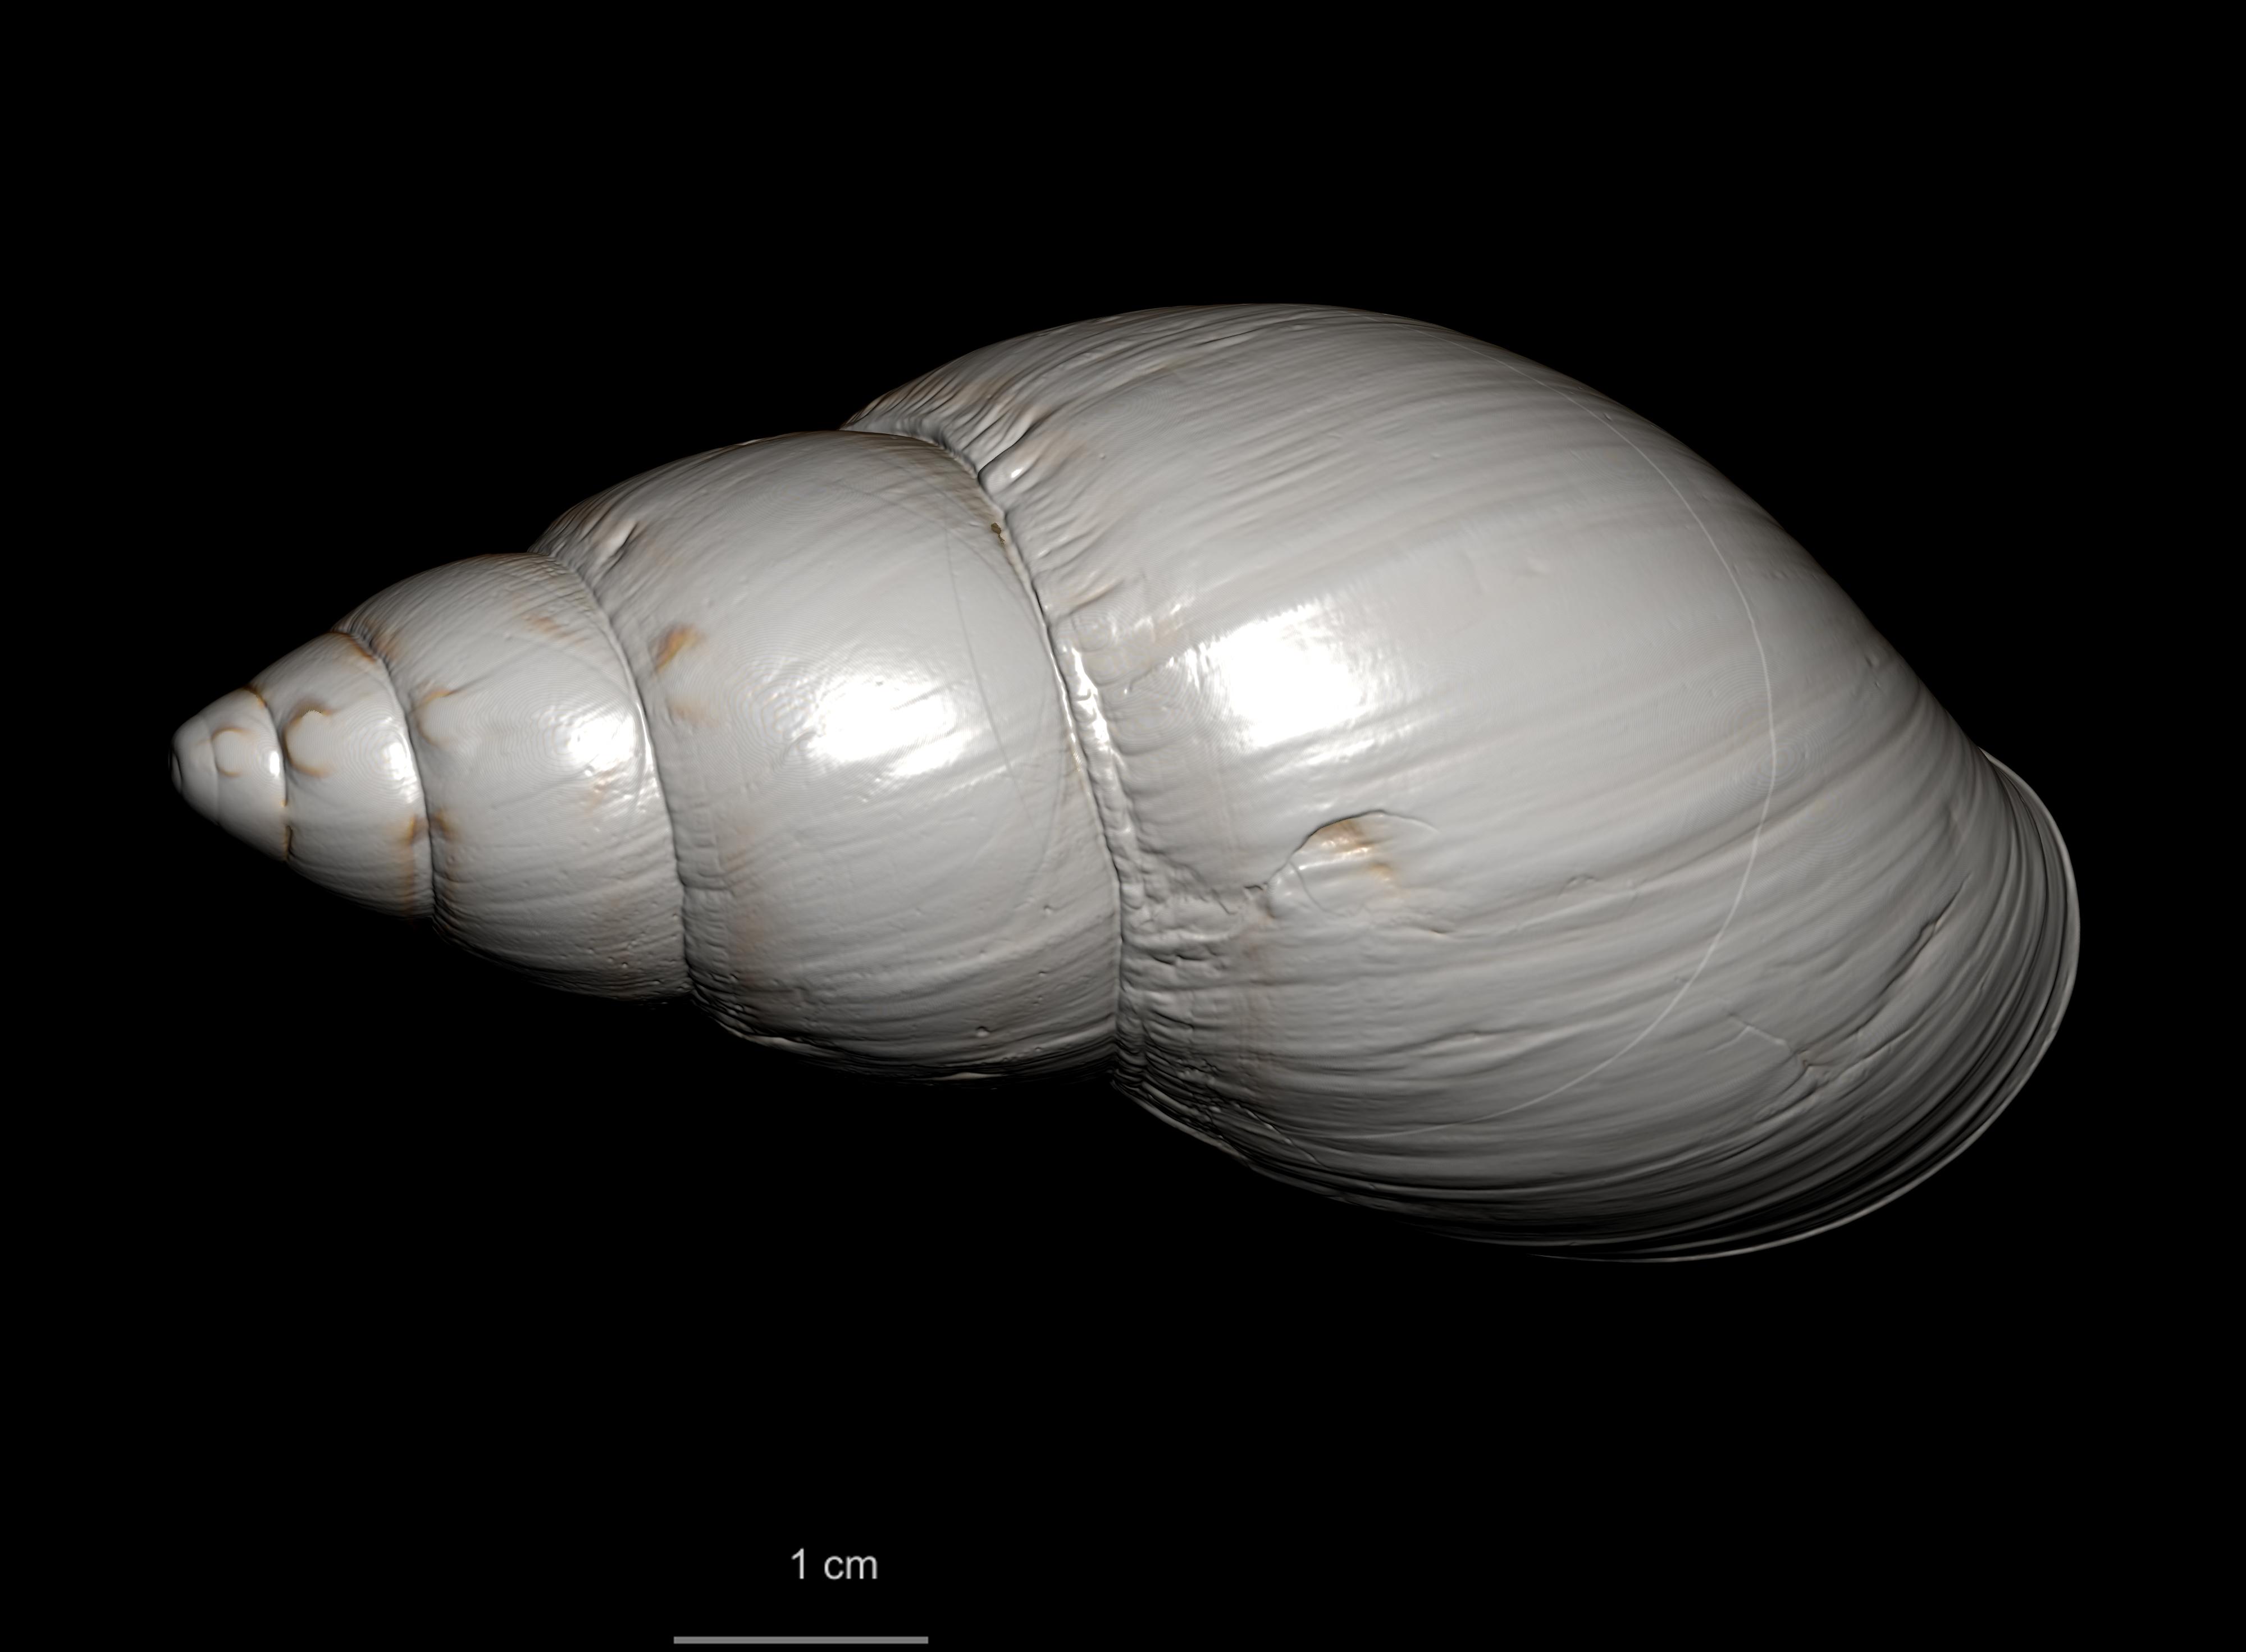 BE-RBINS-INV PARALECTOTYPE MT 2359 Thaumastus thomsonii lutea MCT RX DORSAL.jpg